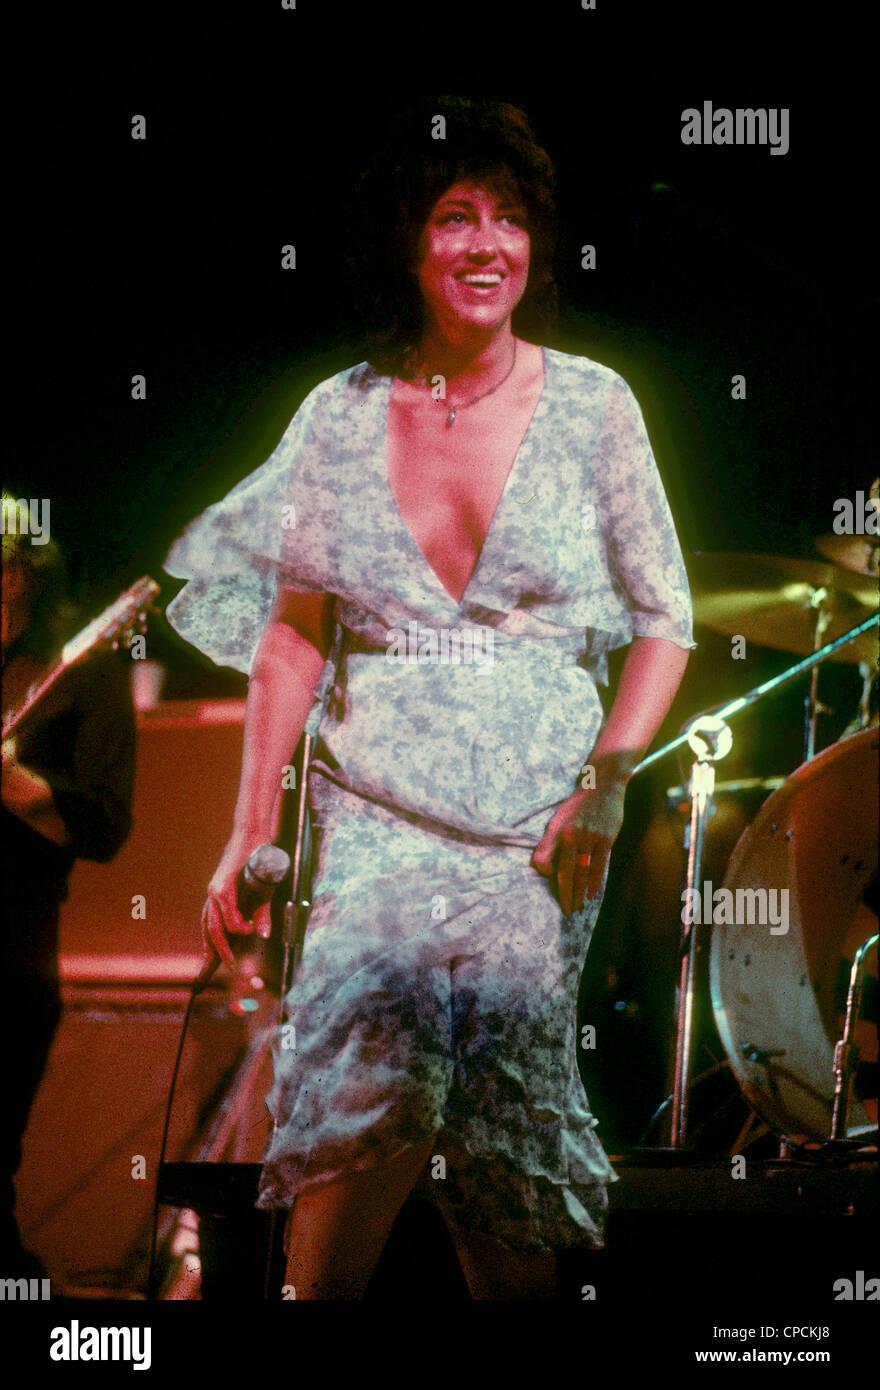 JEFFERSON STARSHIP US rock group about 1975 with Grace Slick - Stock Image